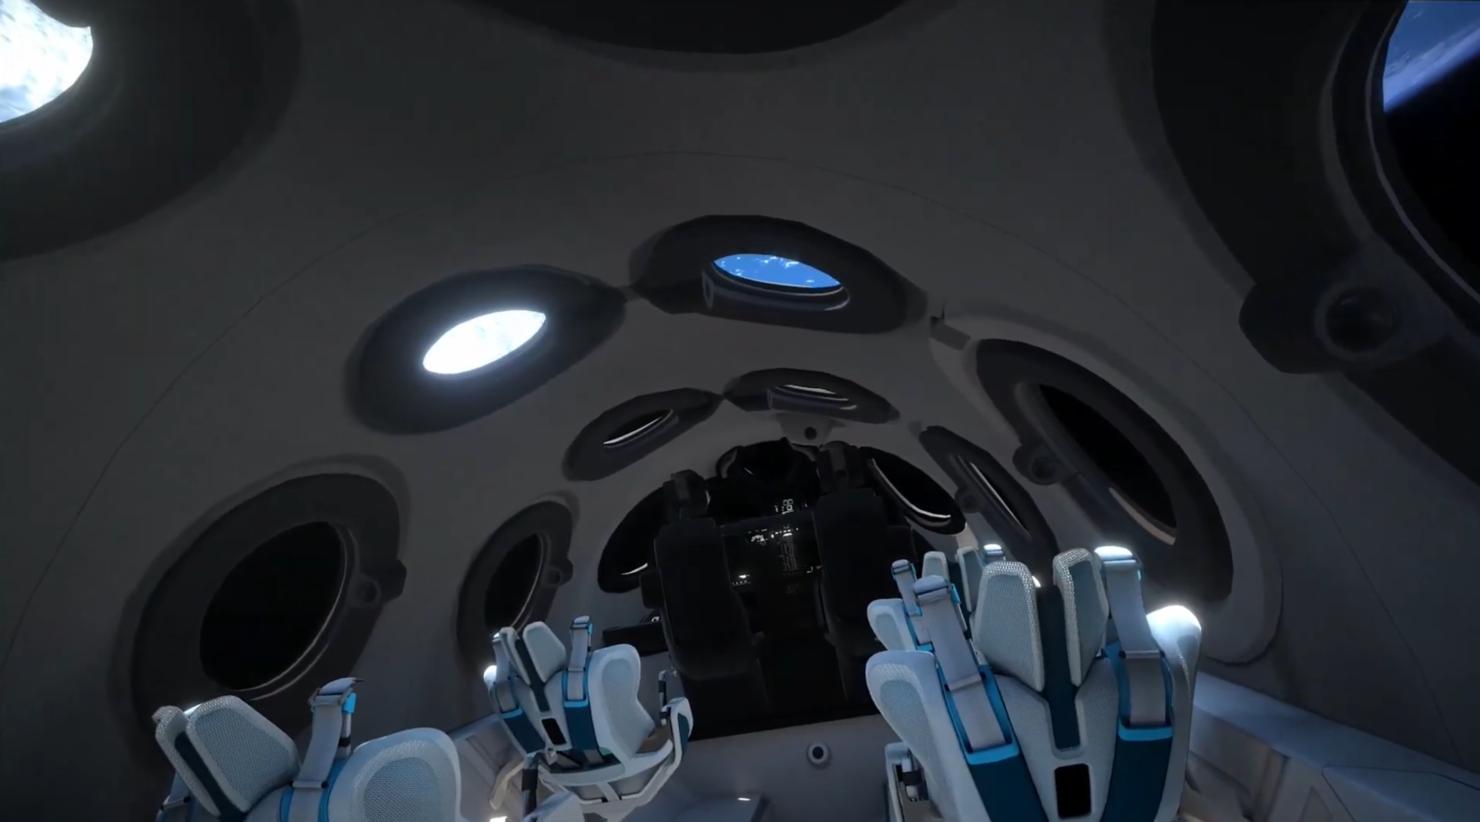 spaceshiptwo-cabin-interior-view